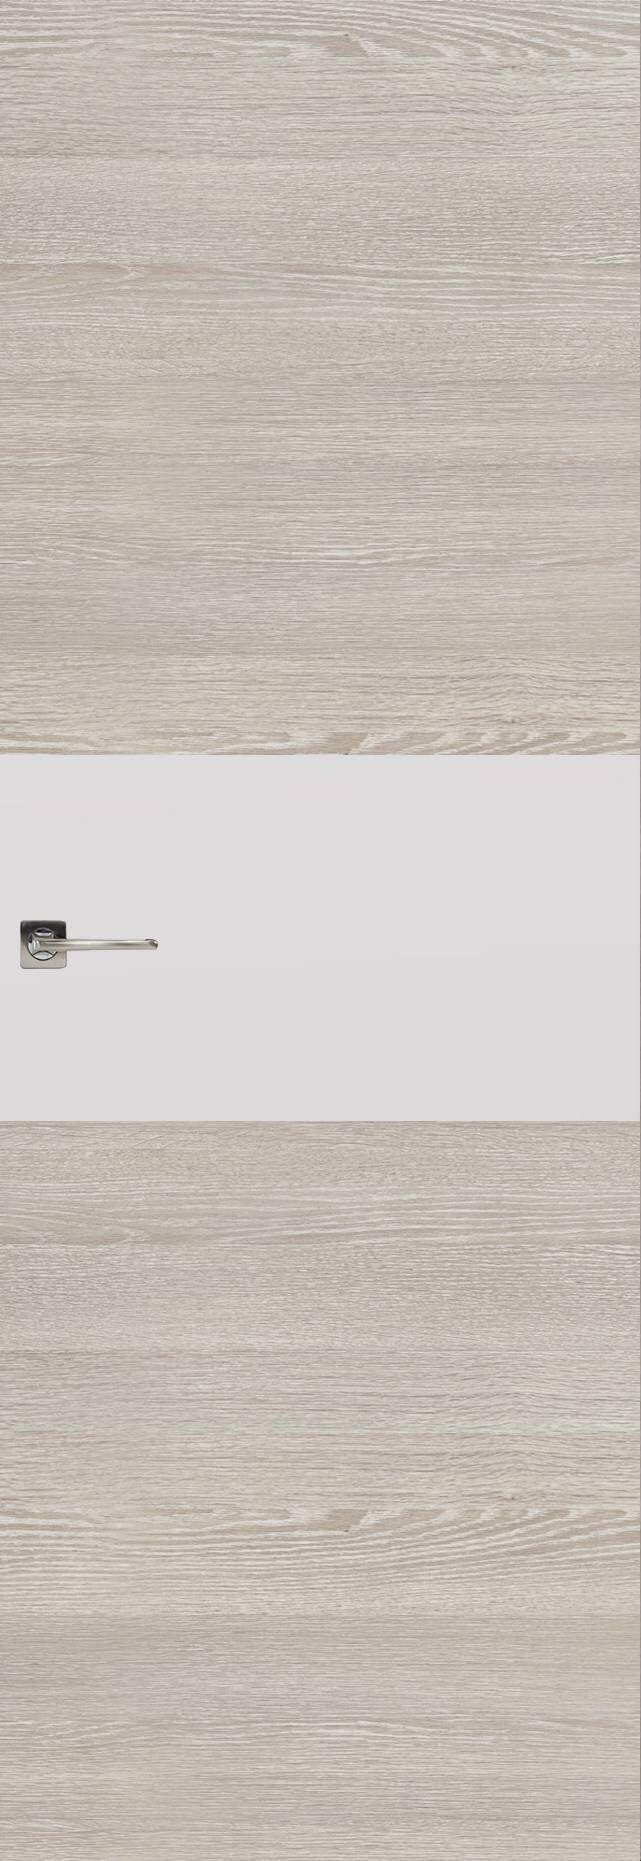 Tivoli Е-4 Invisible цвет - Серый дуб Без стекла (ДГ)